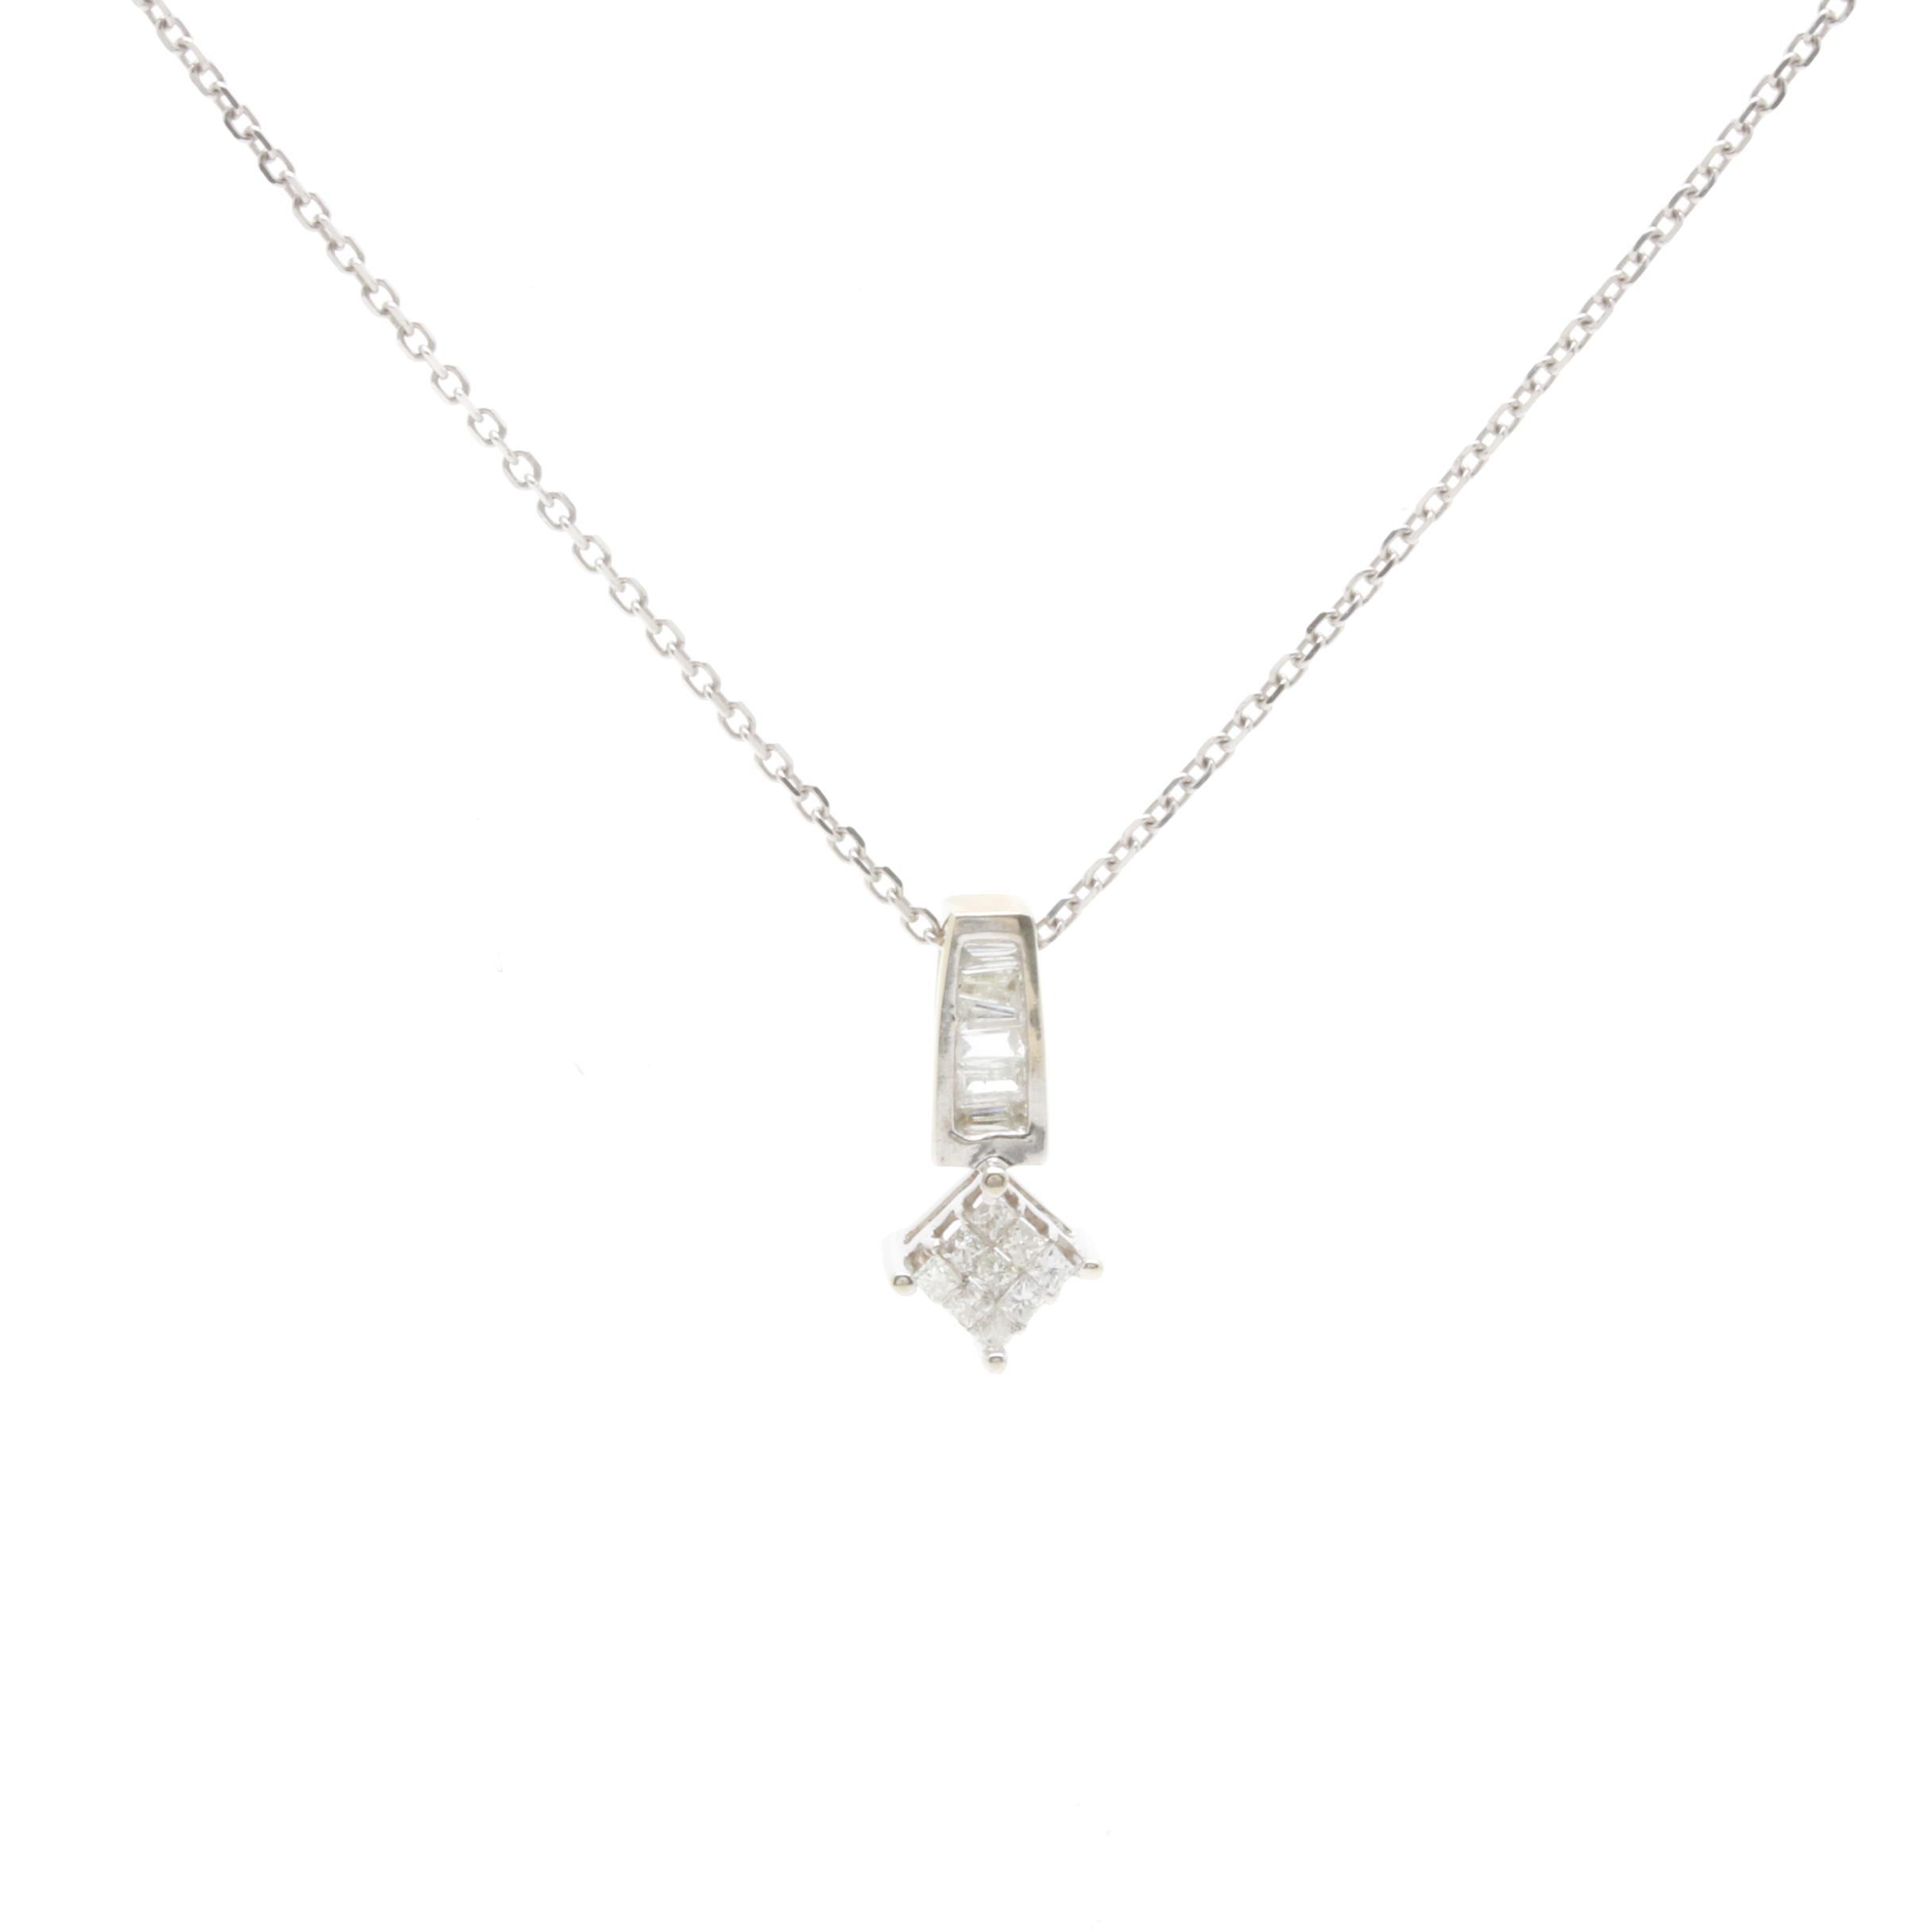 10K White Gold Diamond Pendant on 14K Gold Chain Necklace